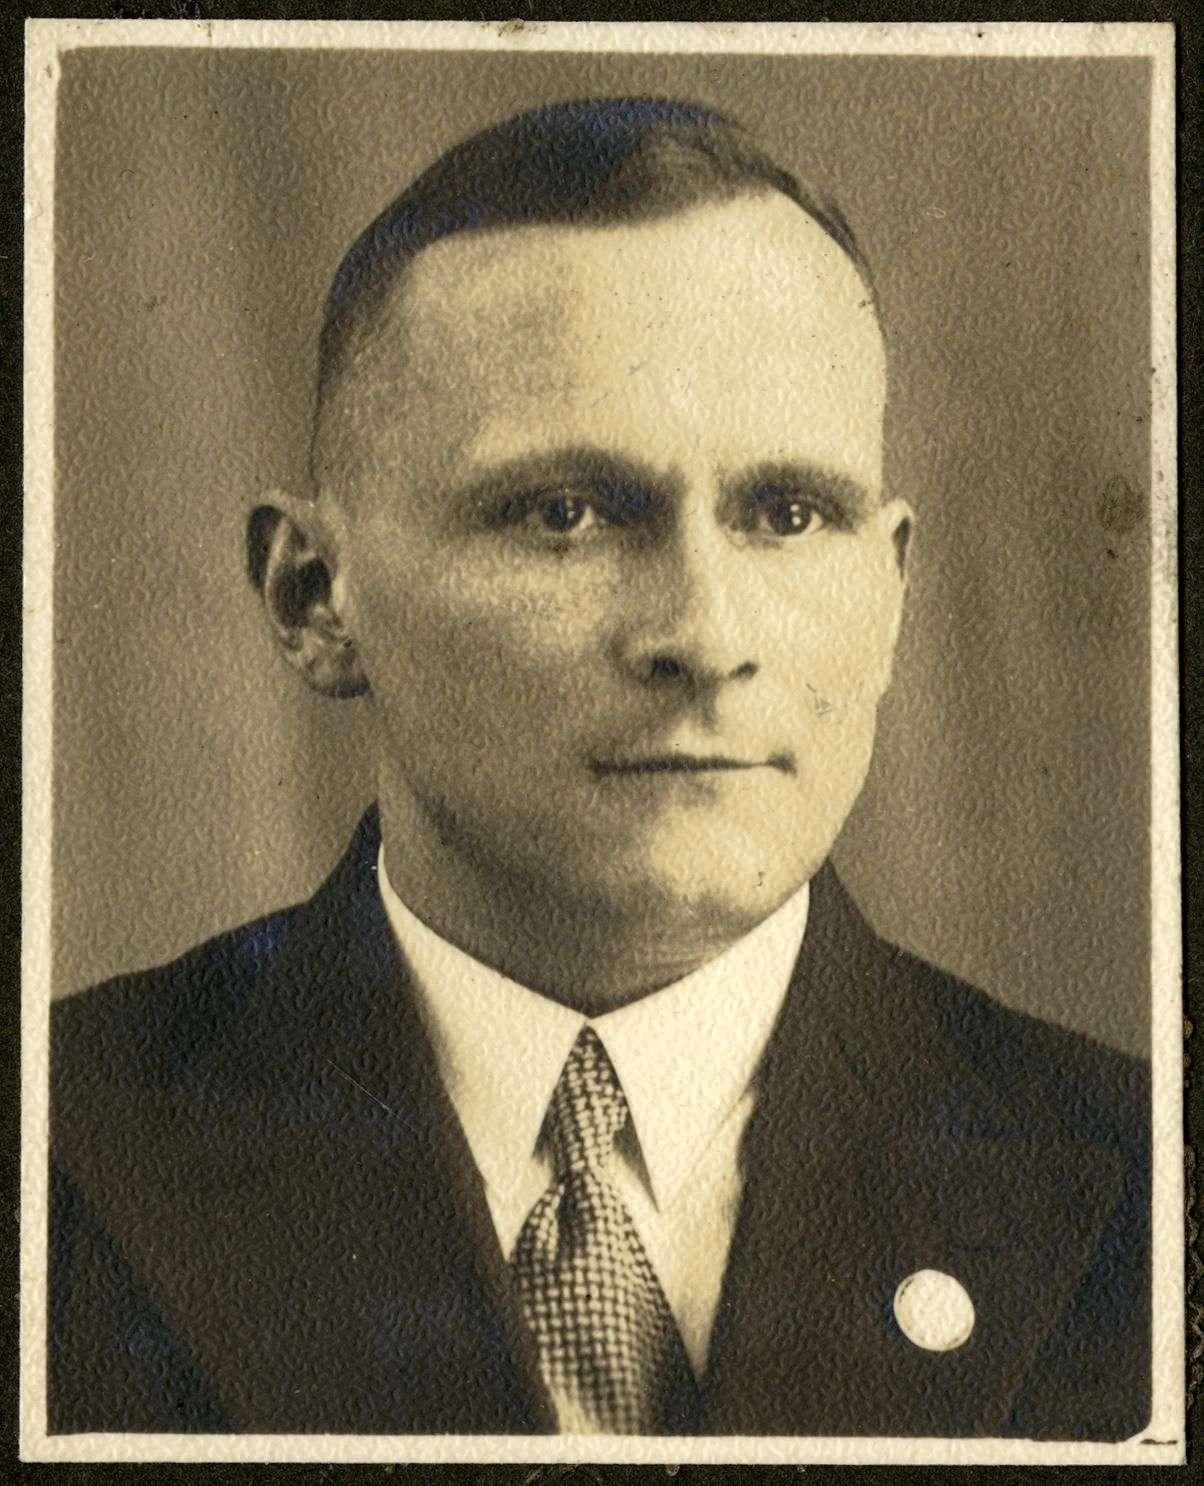 Sedlackzek, Adolf von, Bild 1